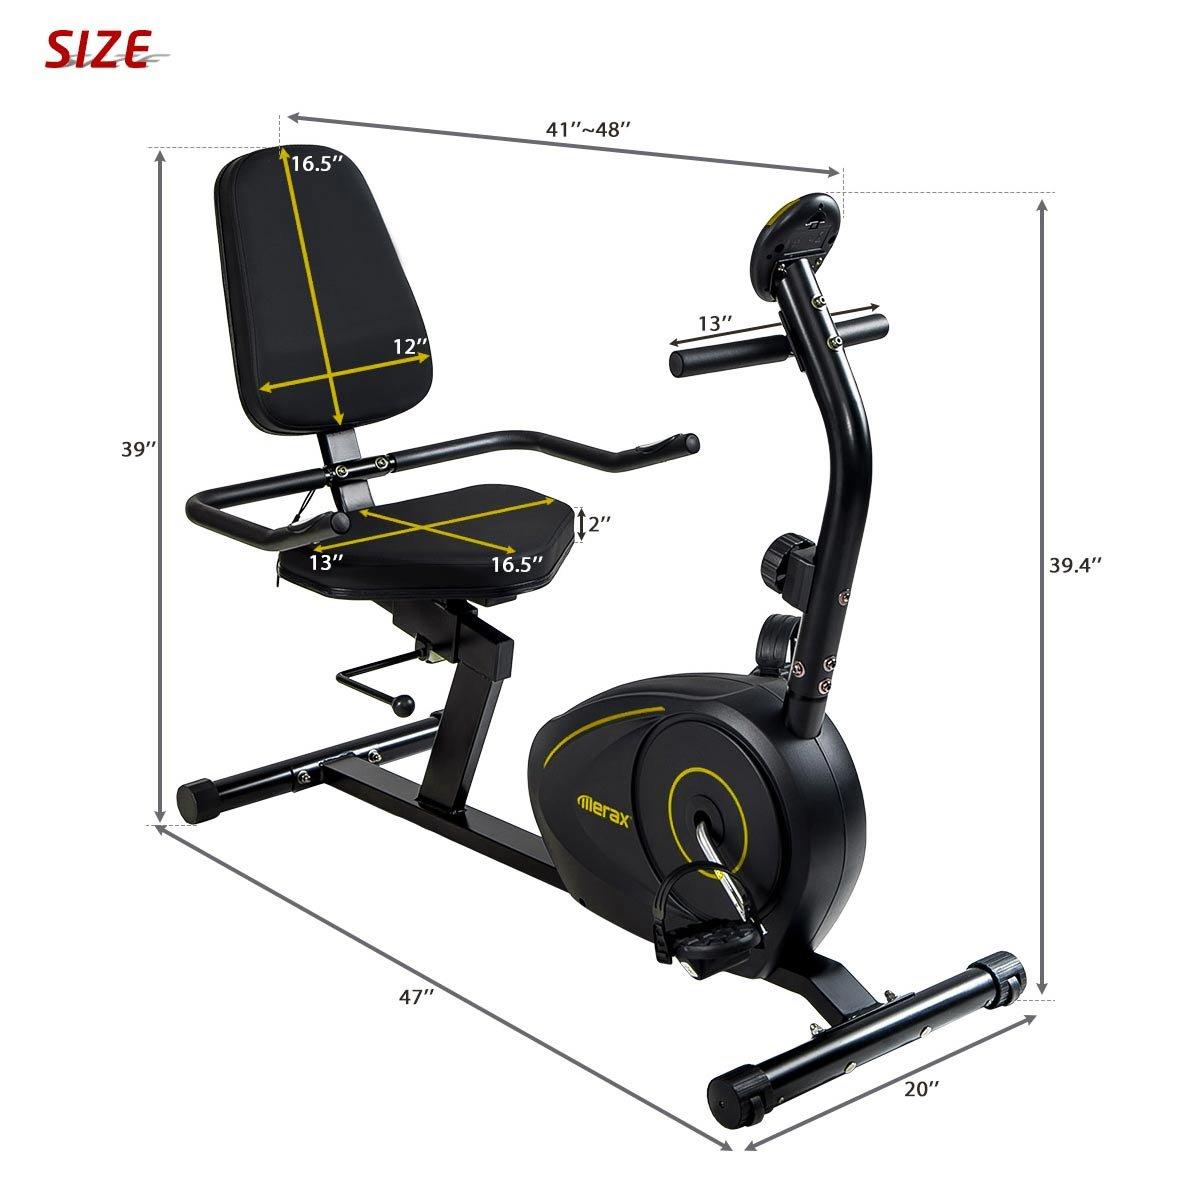 Merax Magnetic Recumbent Exercise Bike | 8-Level Resistance | Quick Adjust Seat (Black 2019) by Merax (Image #9)